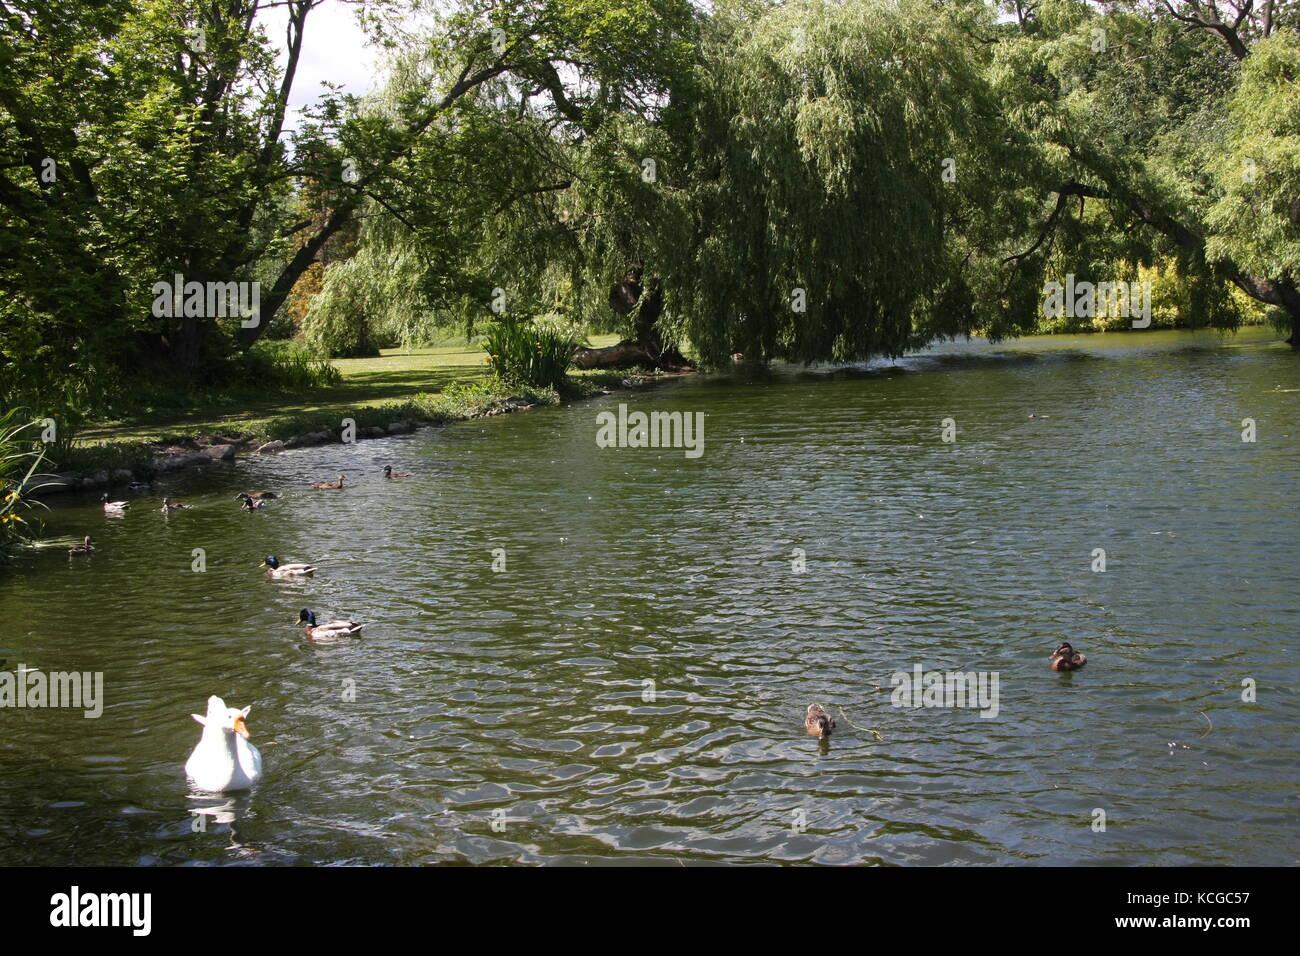 Thwaite Hall Gardens views in Cottingham, East Yorkshire Stock Photo